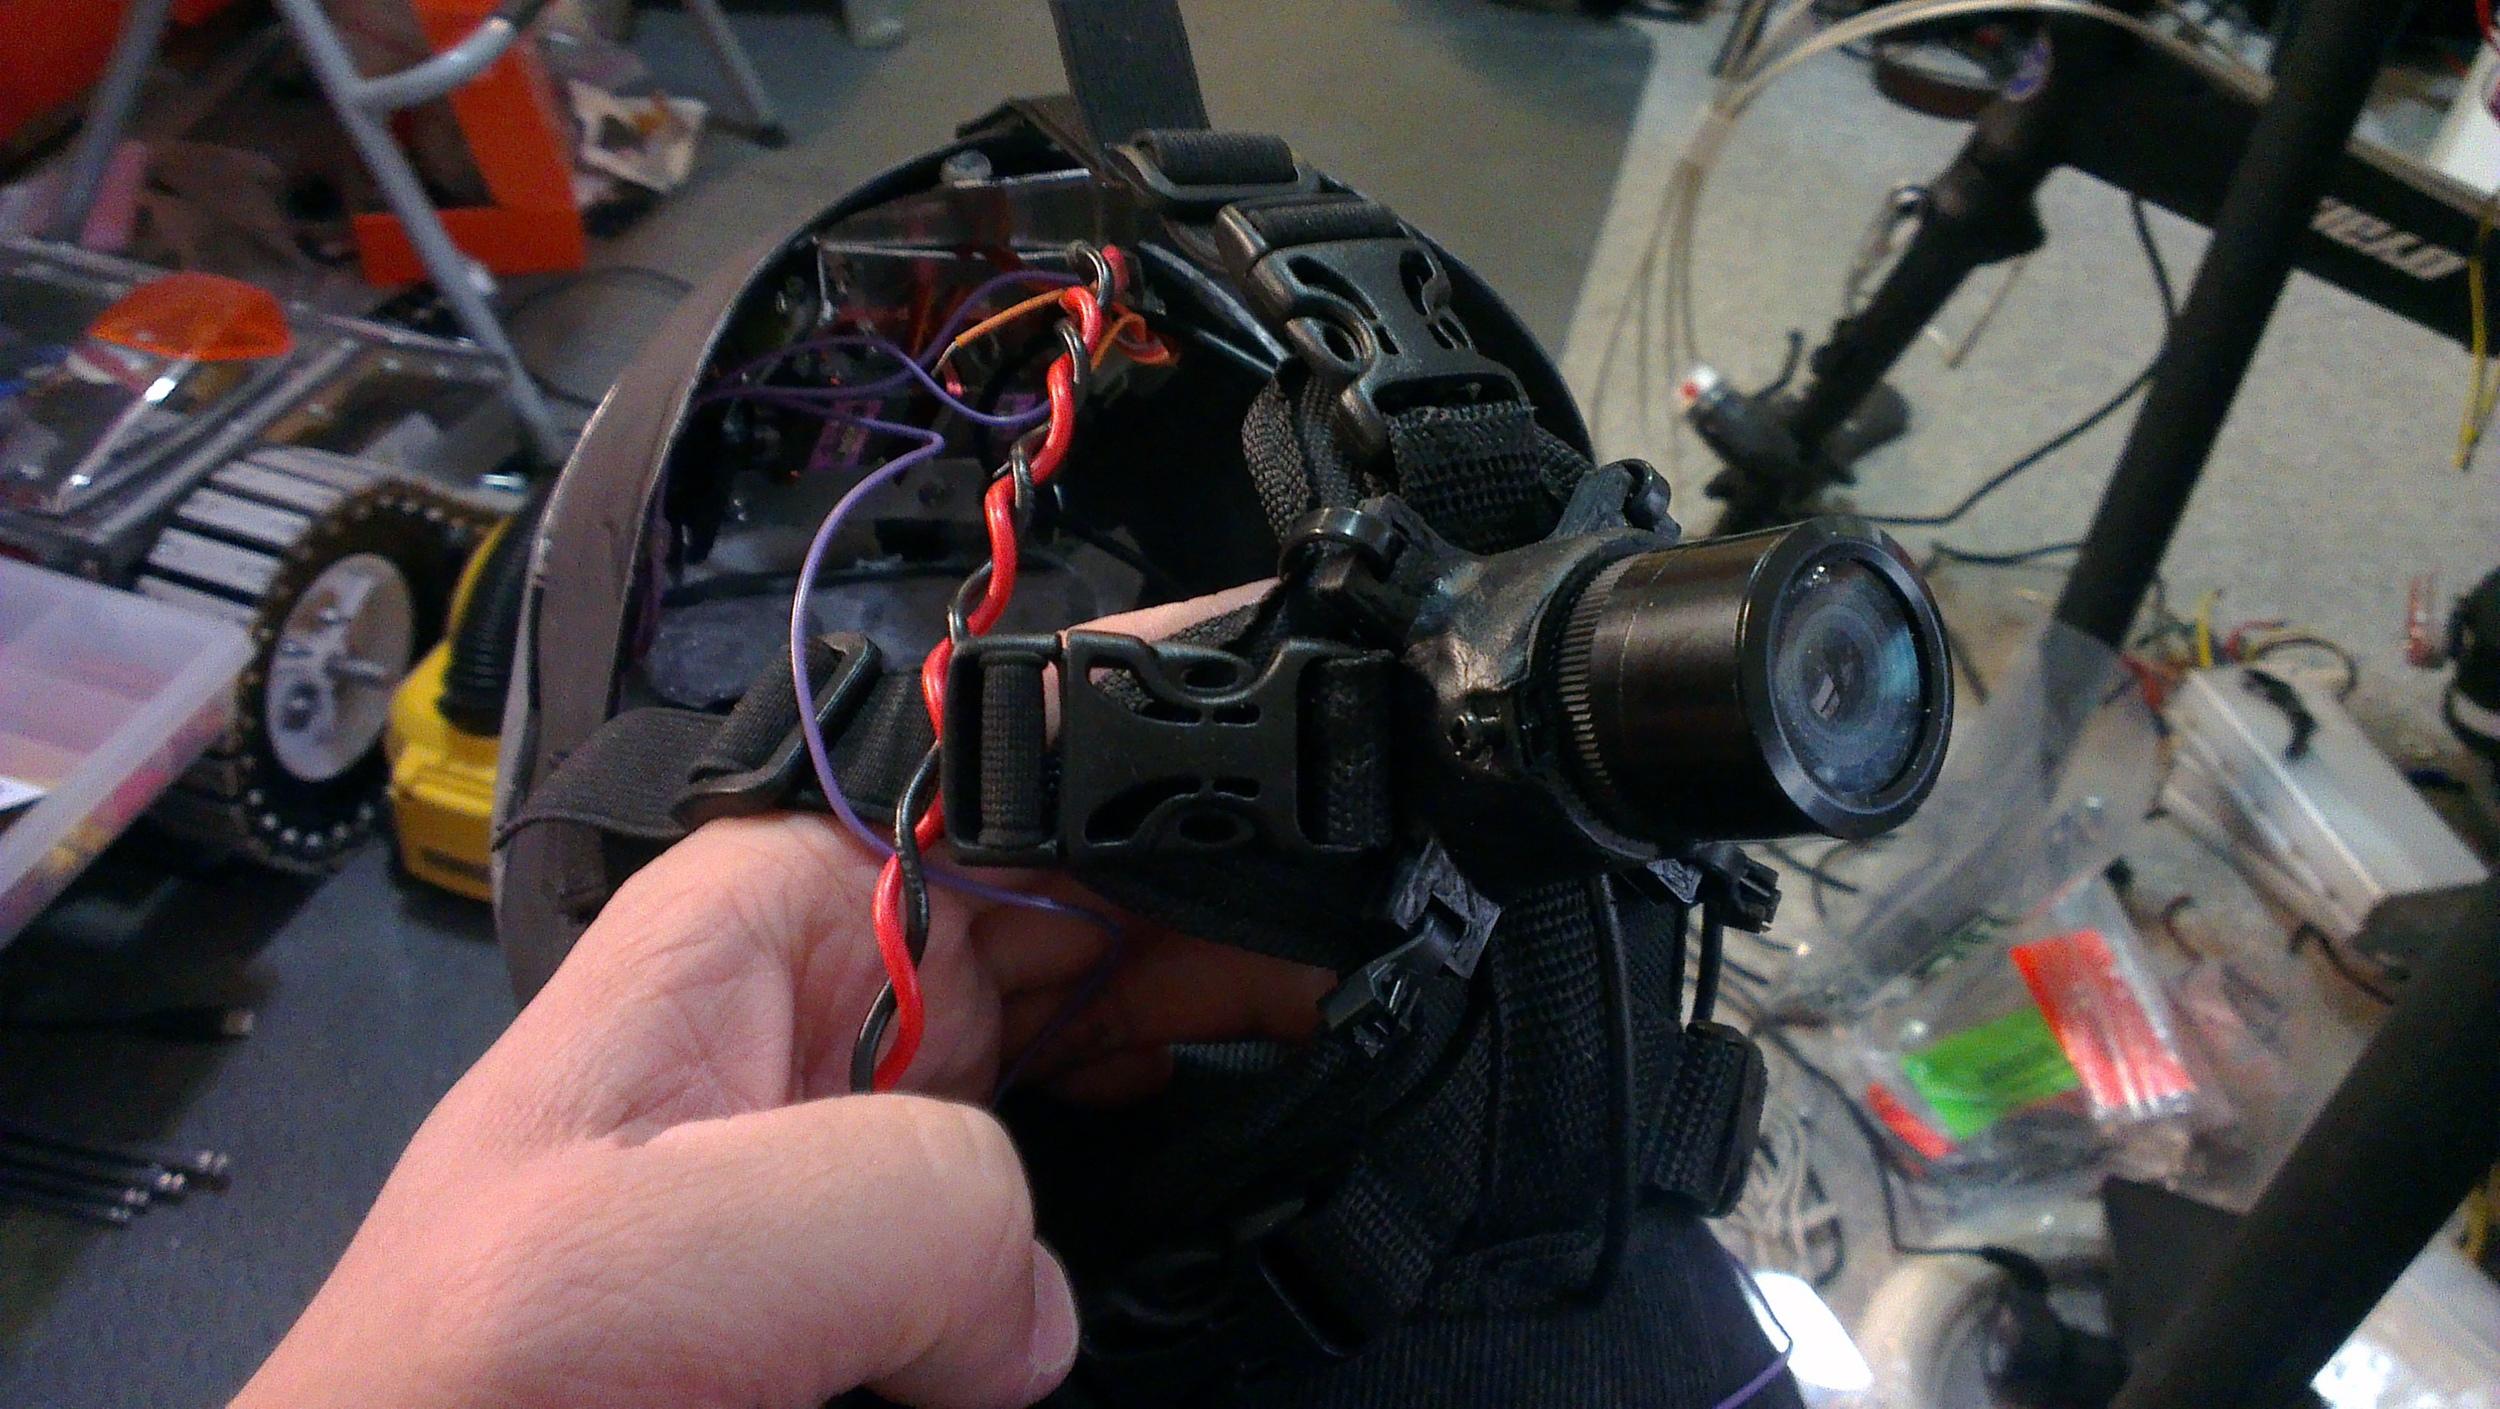 Back camera